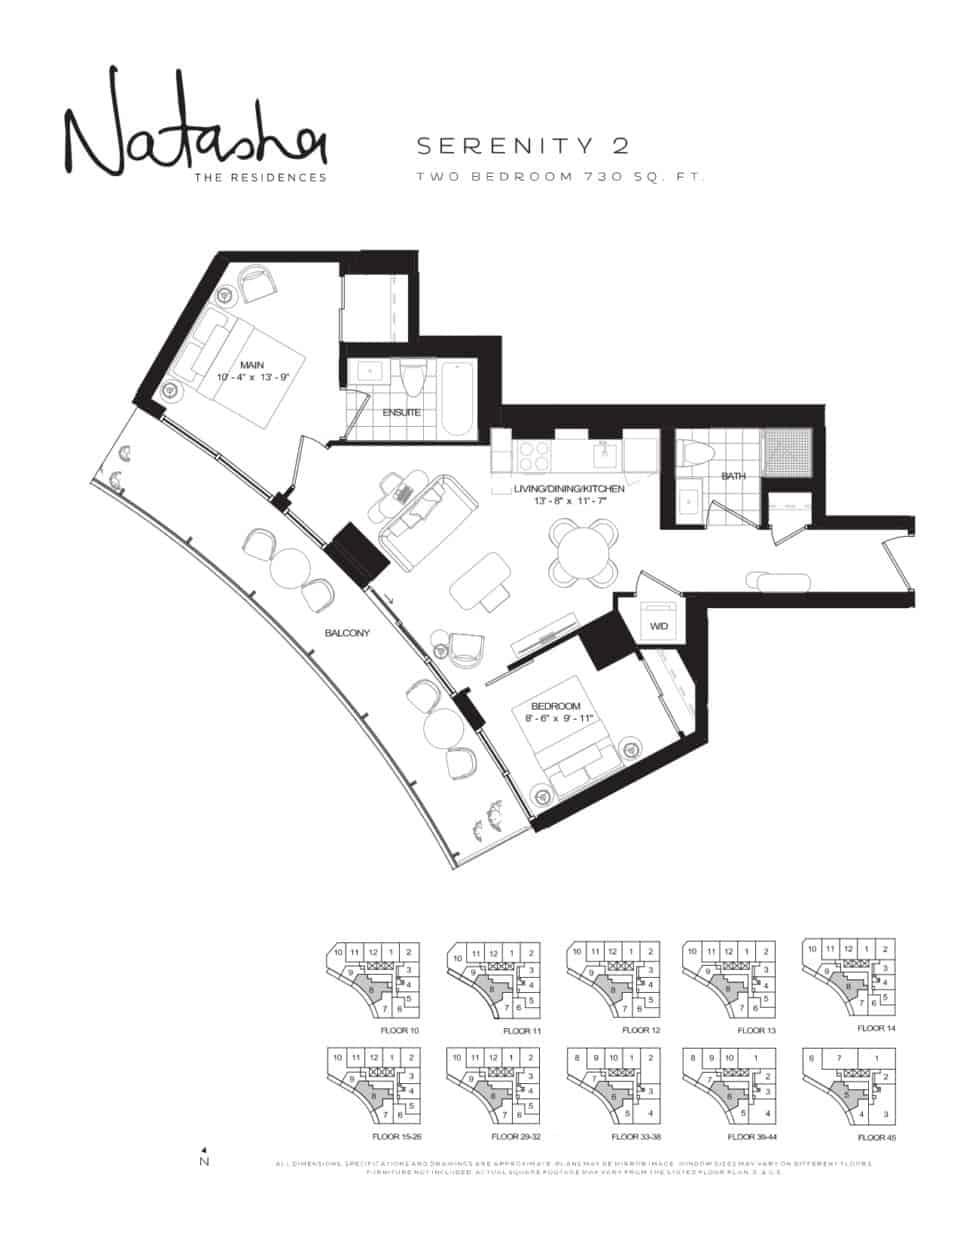 2021 09 02 11 03 10 natashatheresidences lanterradevelopments floorplans serenity2